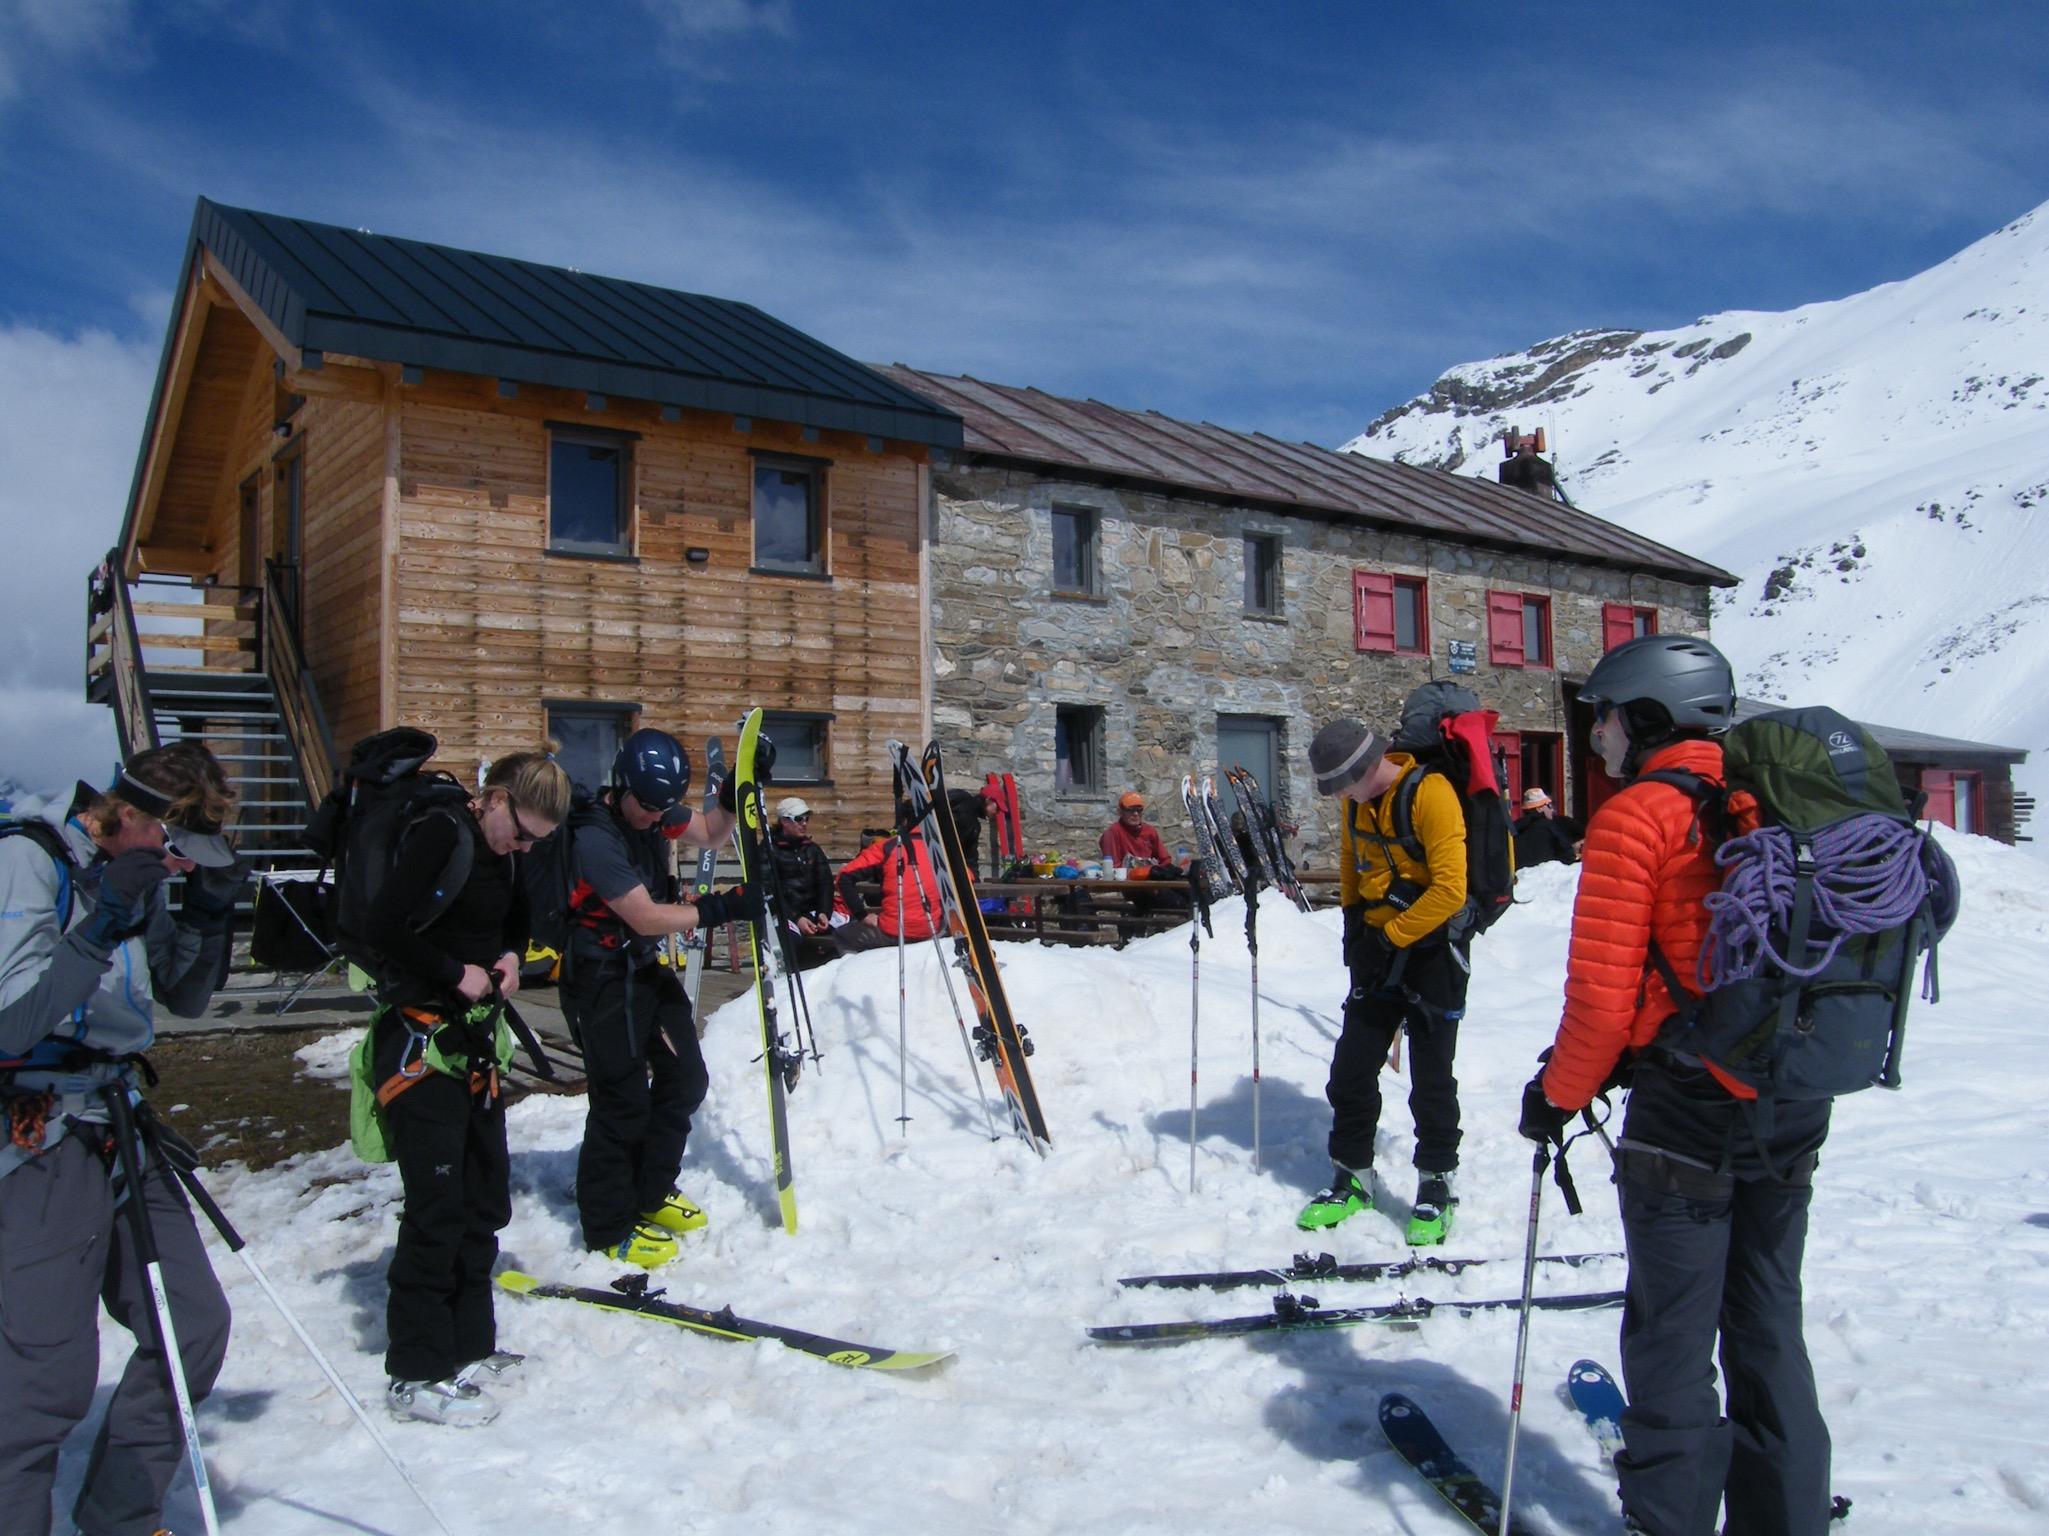 Italy ski touring hut